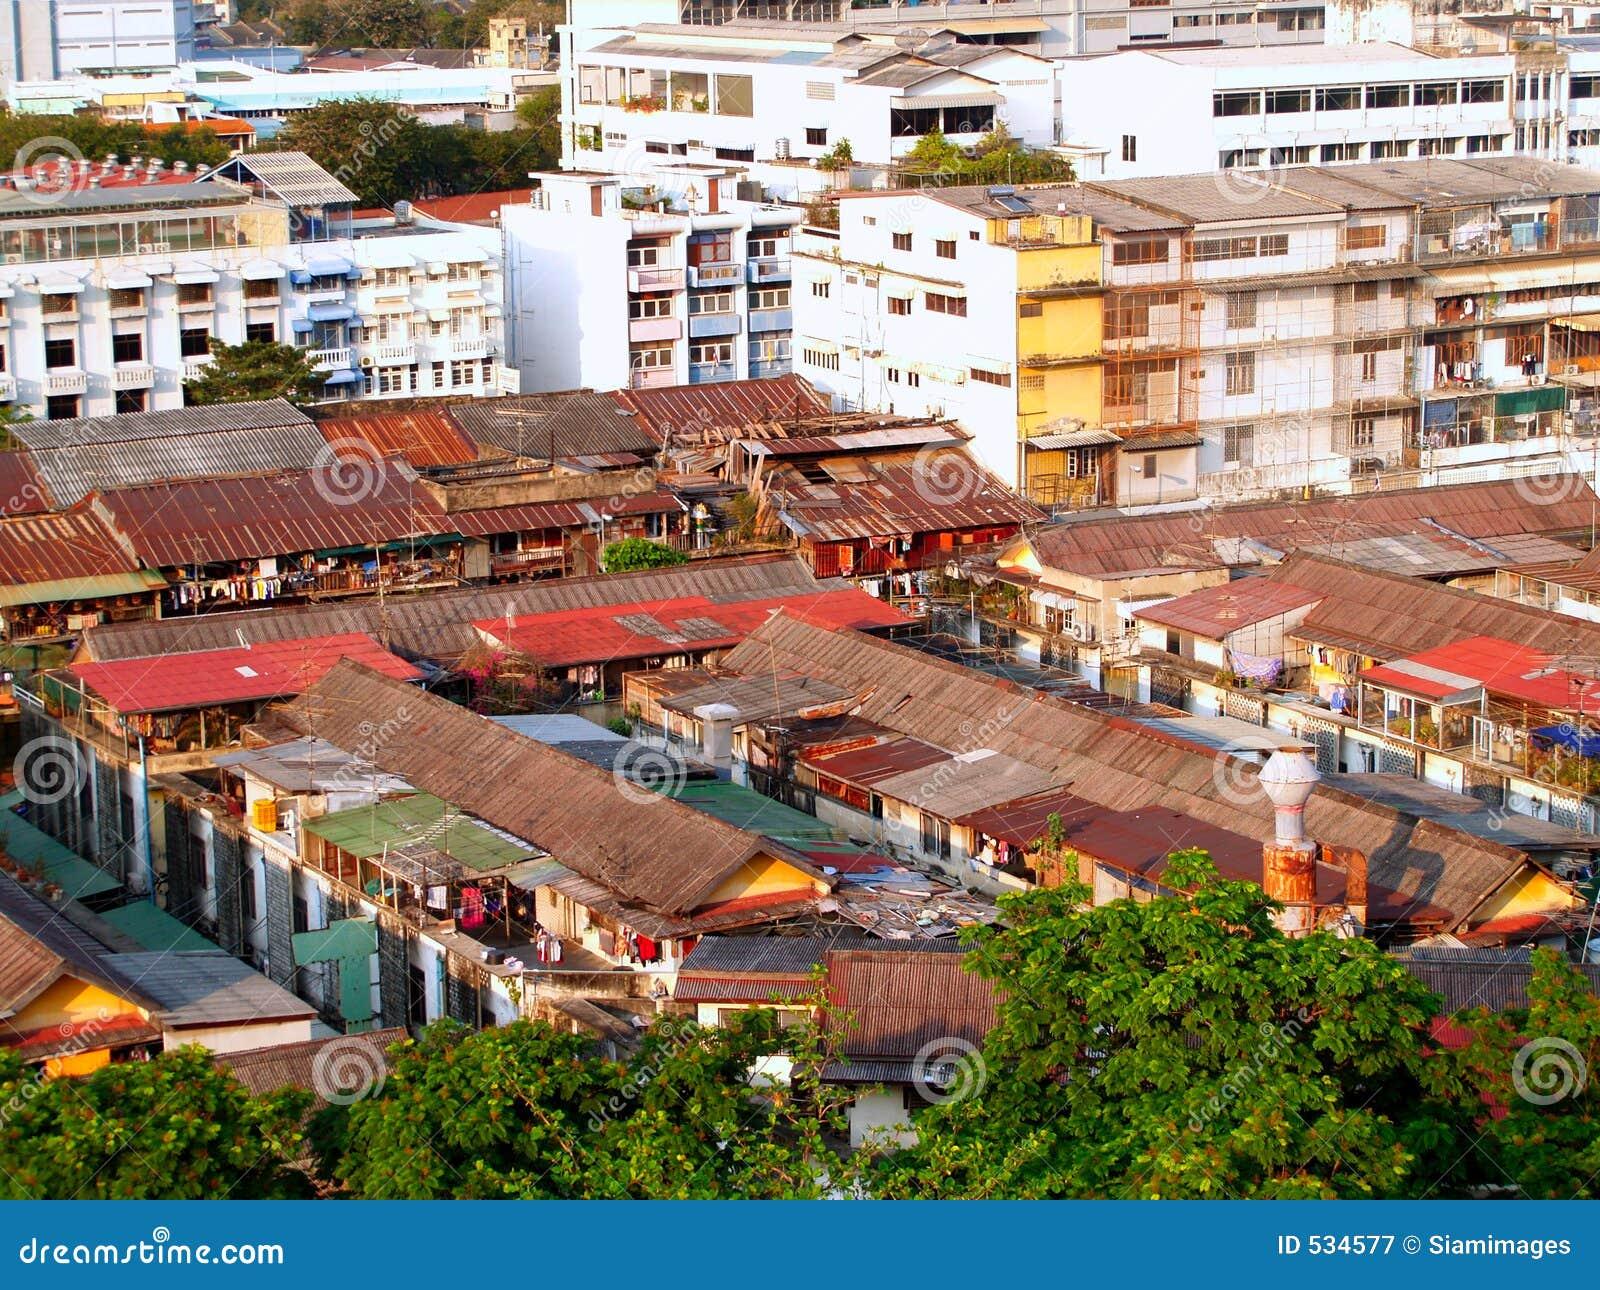 Download 曼谷视图 库存图片. 图片 包括有 天空, 城市, 资本, 聚会所, 拱道, 摩天大楼, 地平线, 布哈拉, 中央 - 534577